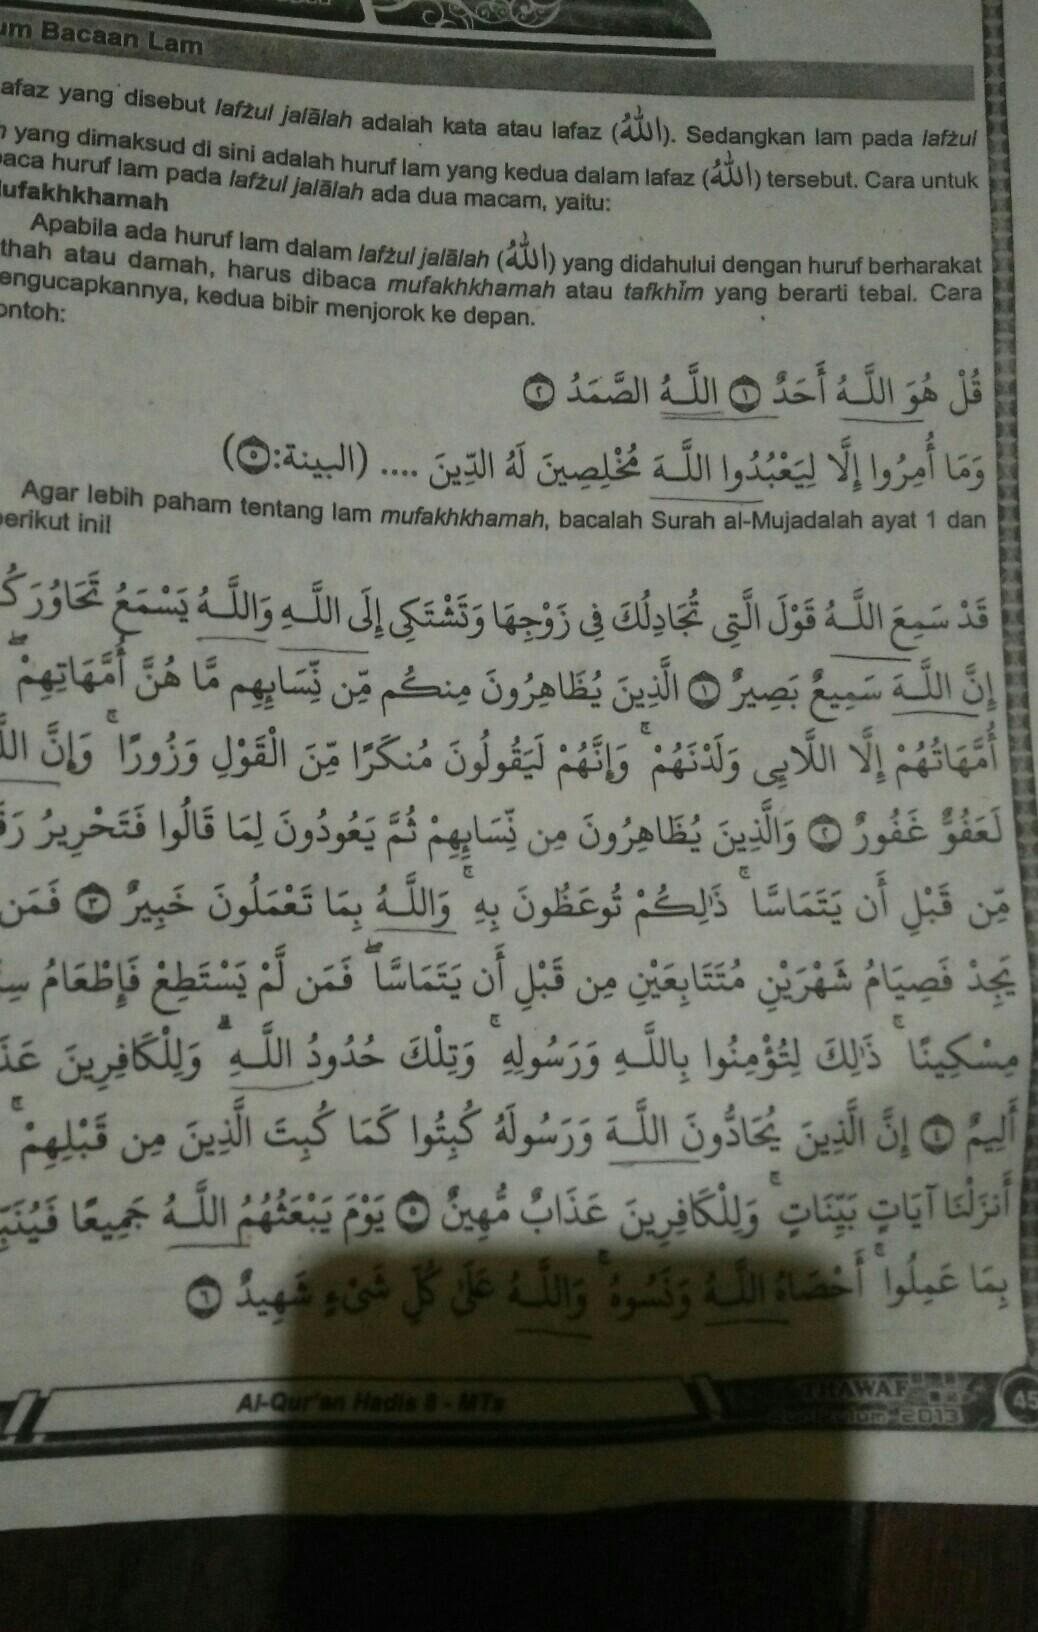 Sebutkan 10 Contoh Bacaan Lam Jalalah Tarqiq Dan 10 Bacaan Lam Jalalah Tafkhim Beserta Ayat Dan Brainly Co Id